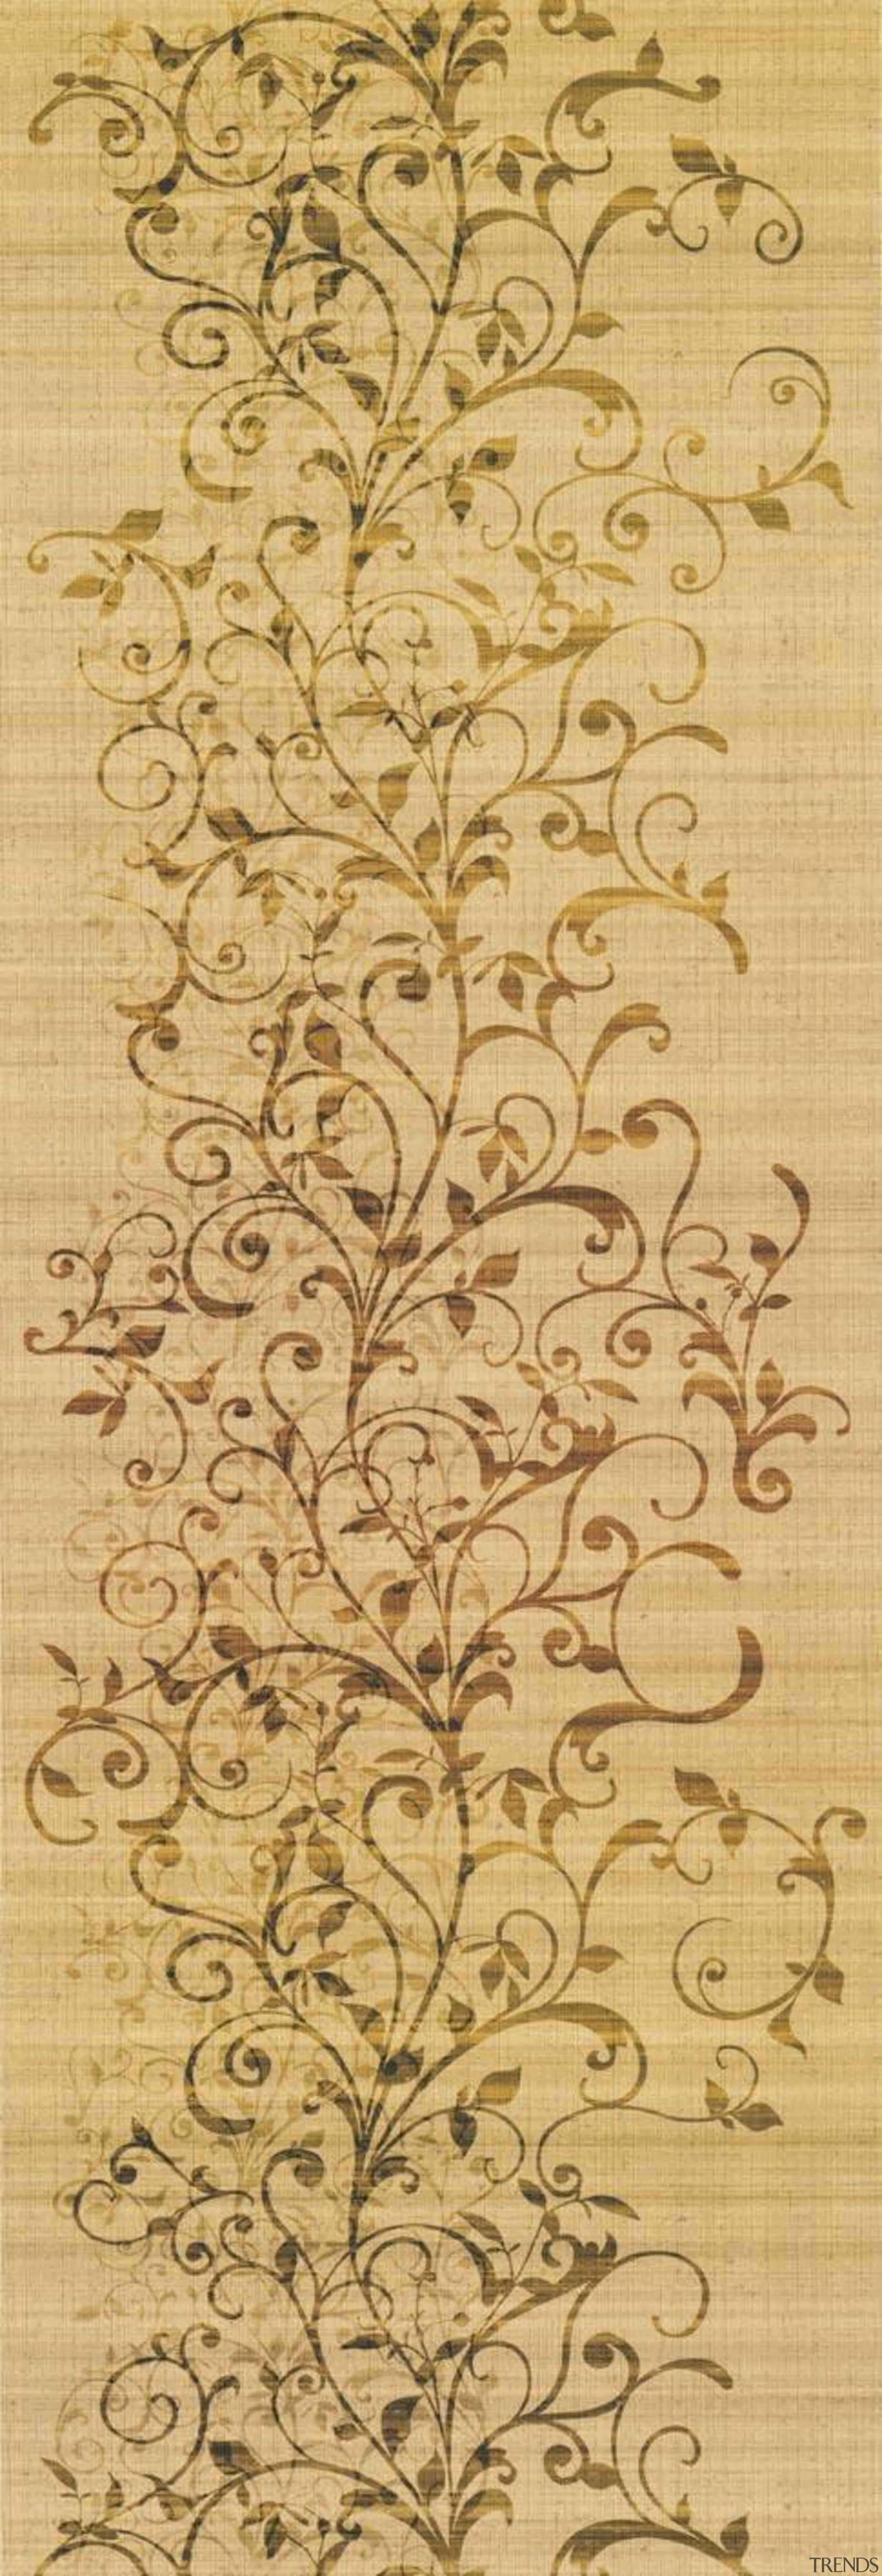 Venetian Damask Range - flora | text | flora, text, orange